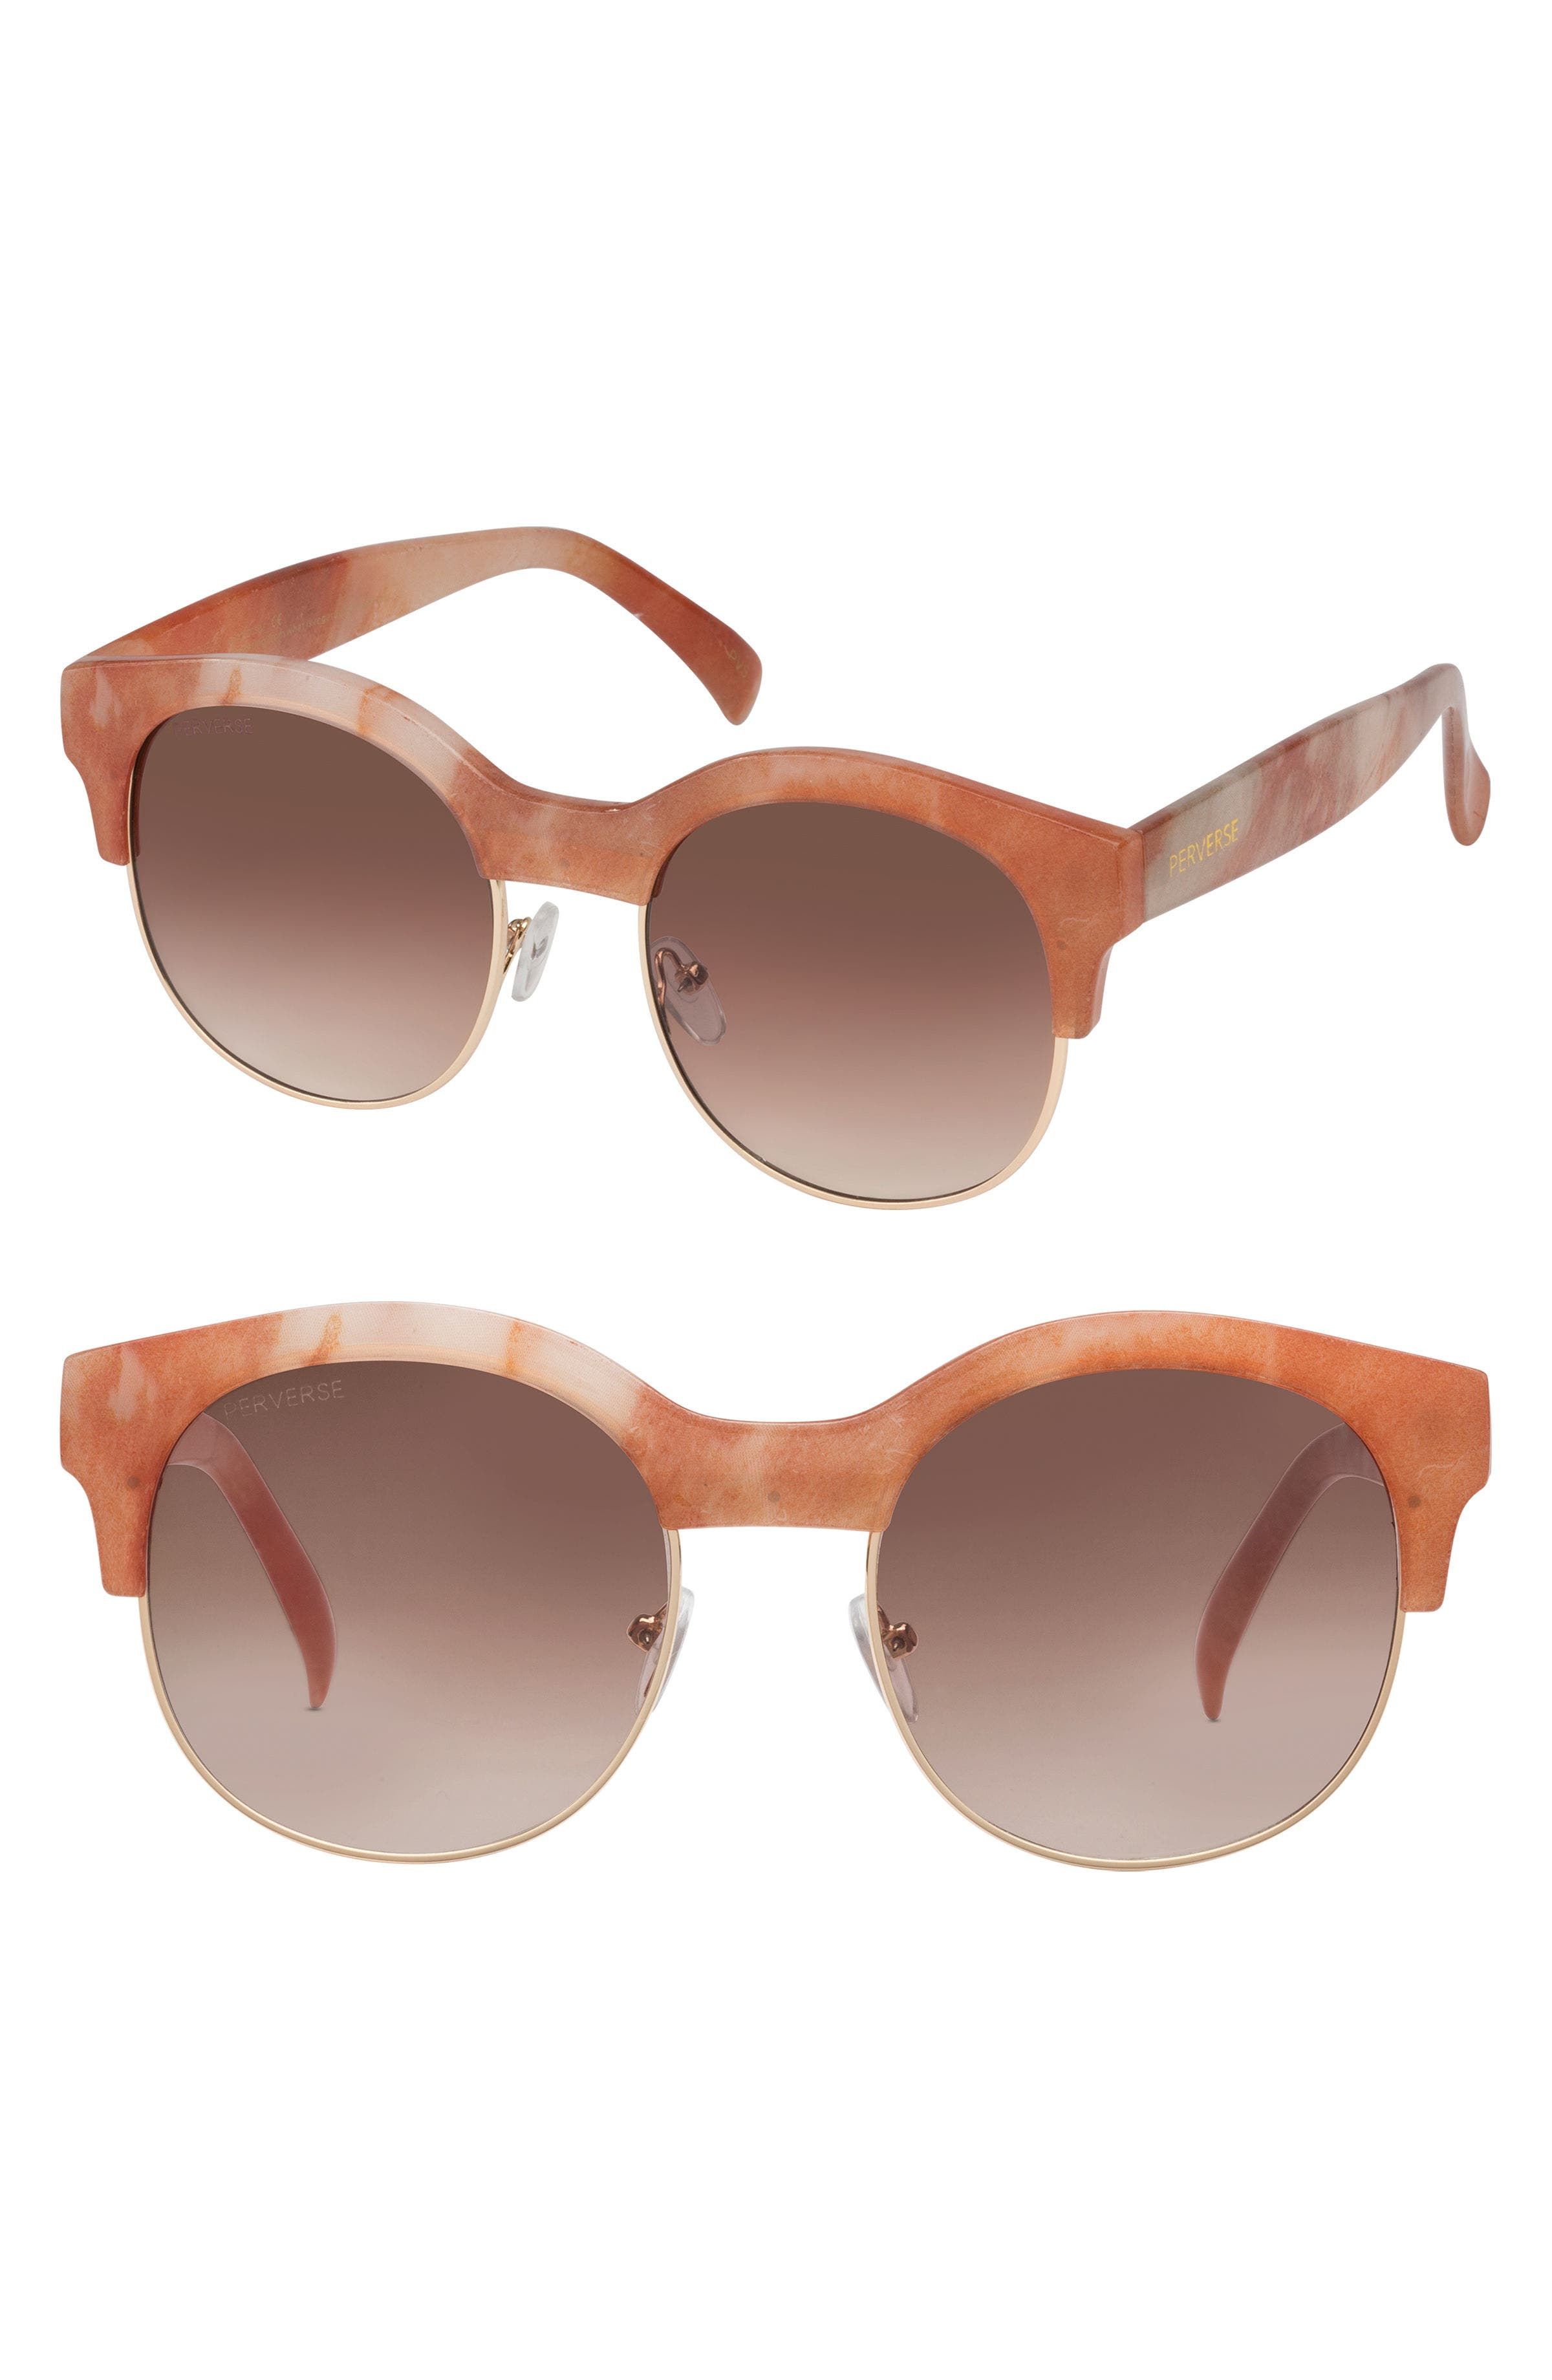 Greek 50mm Round Sunglasses,                             Main thumbnail 1, color,                             100